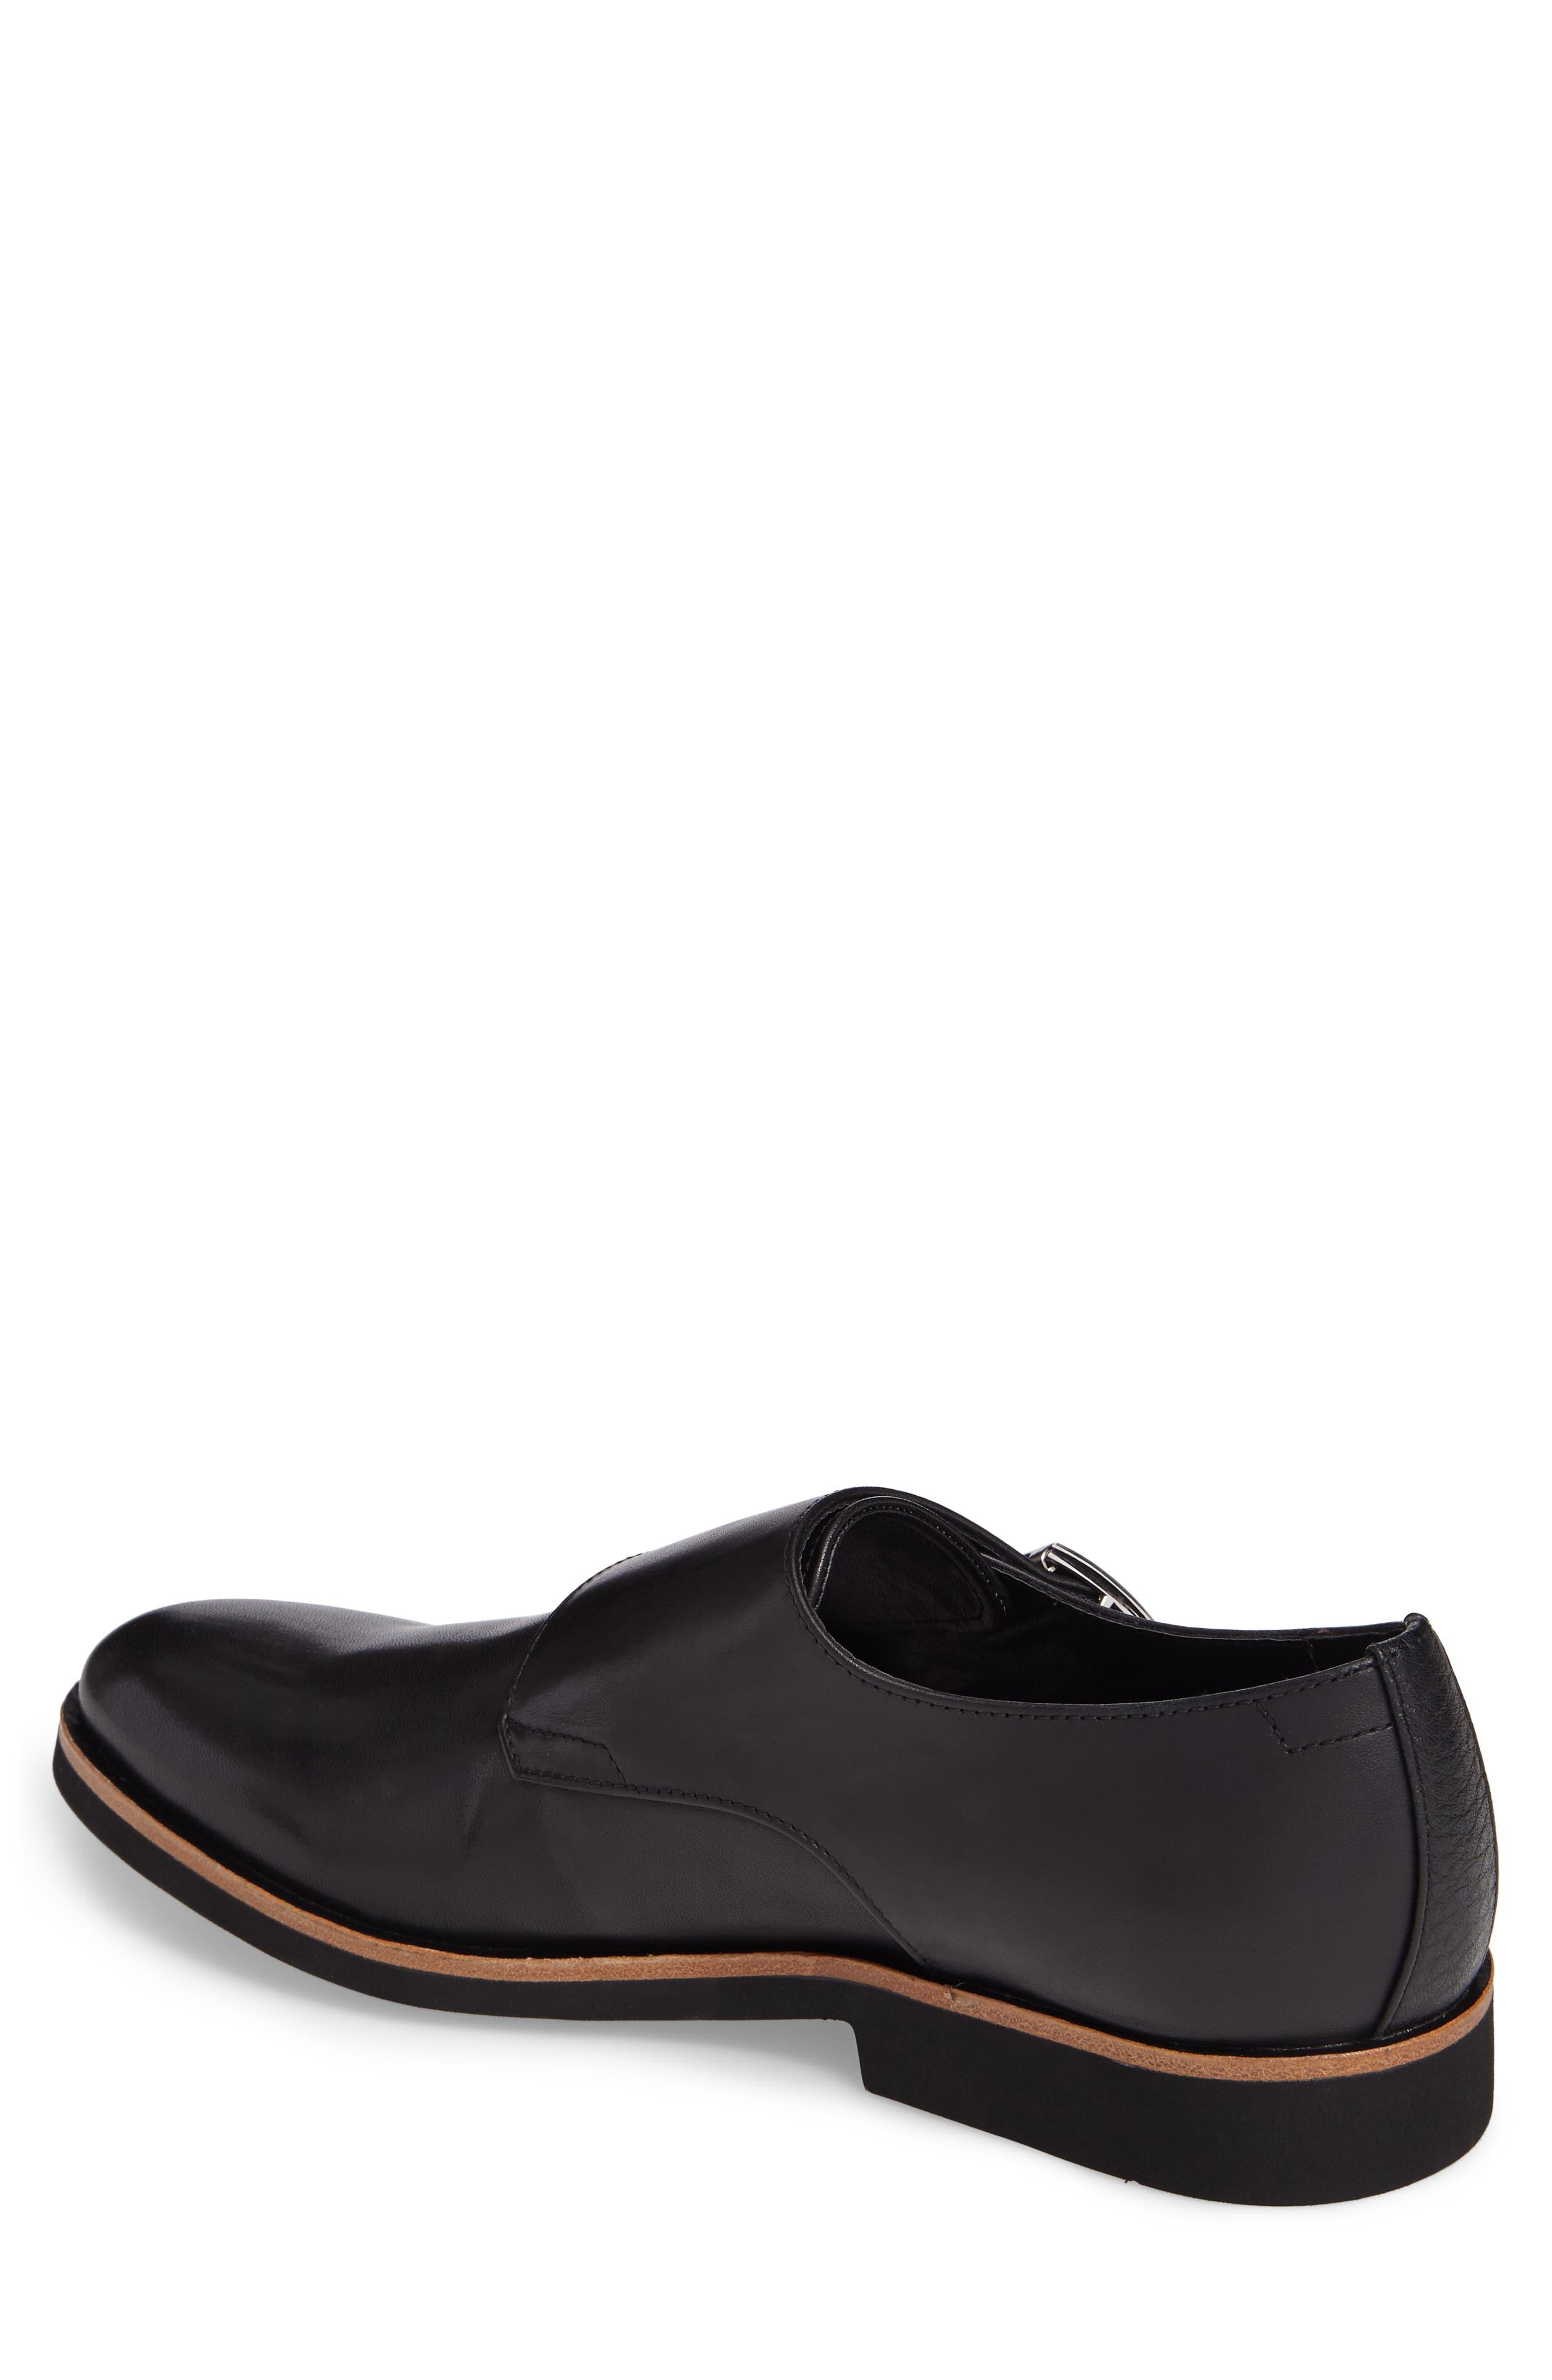 Finnegan Double Monk Strap Shoe,                             Alternate thumbnail 2, color,                             Black Leather